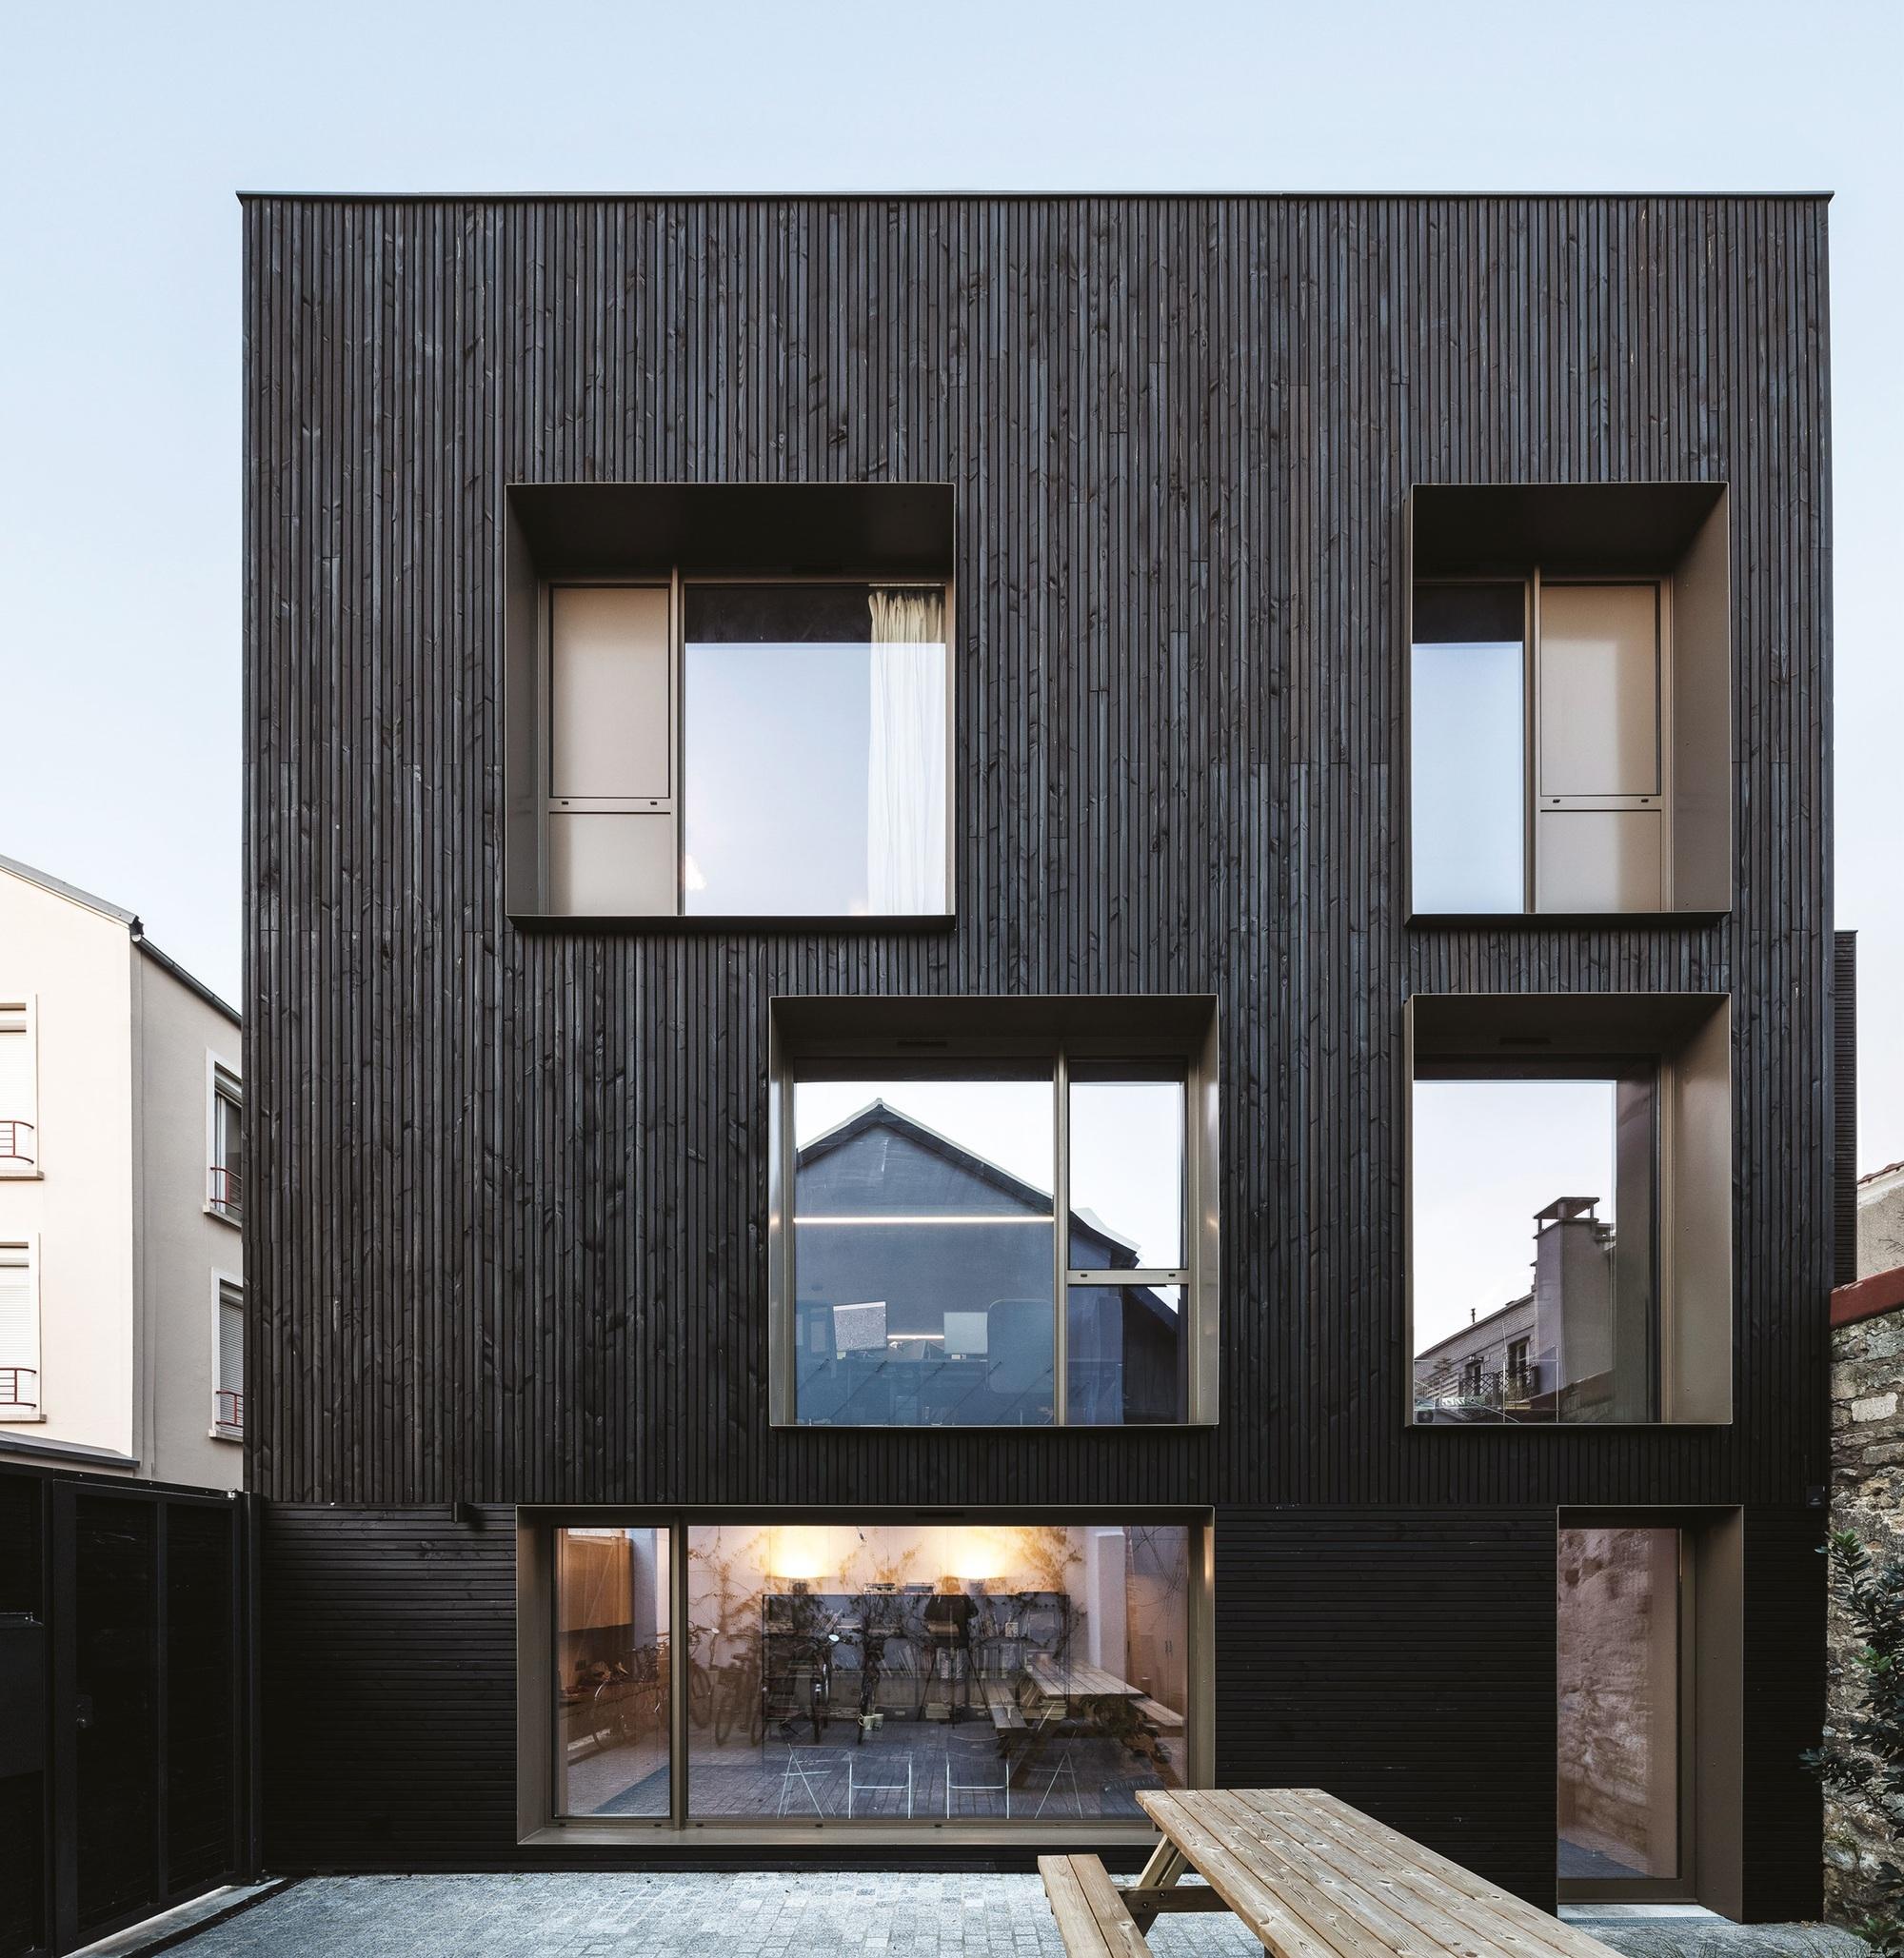 RMDM House / MRDM Architectes